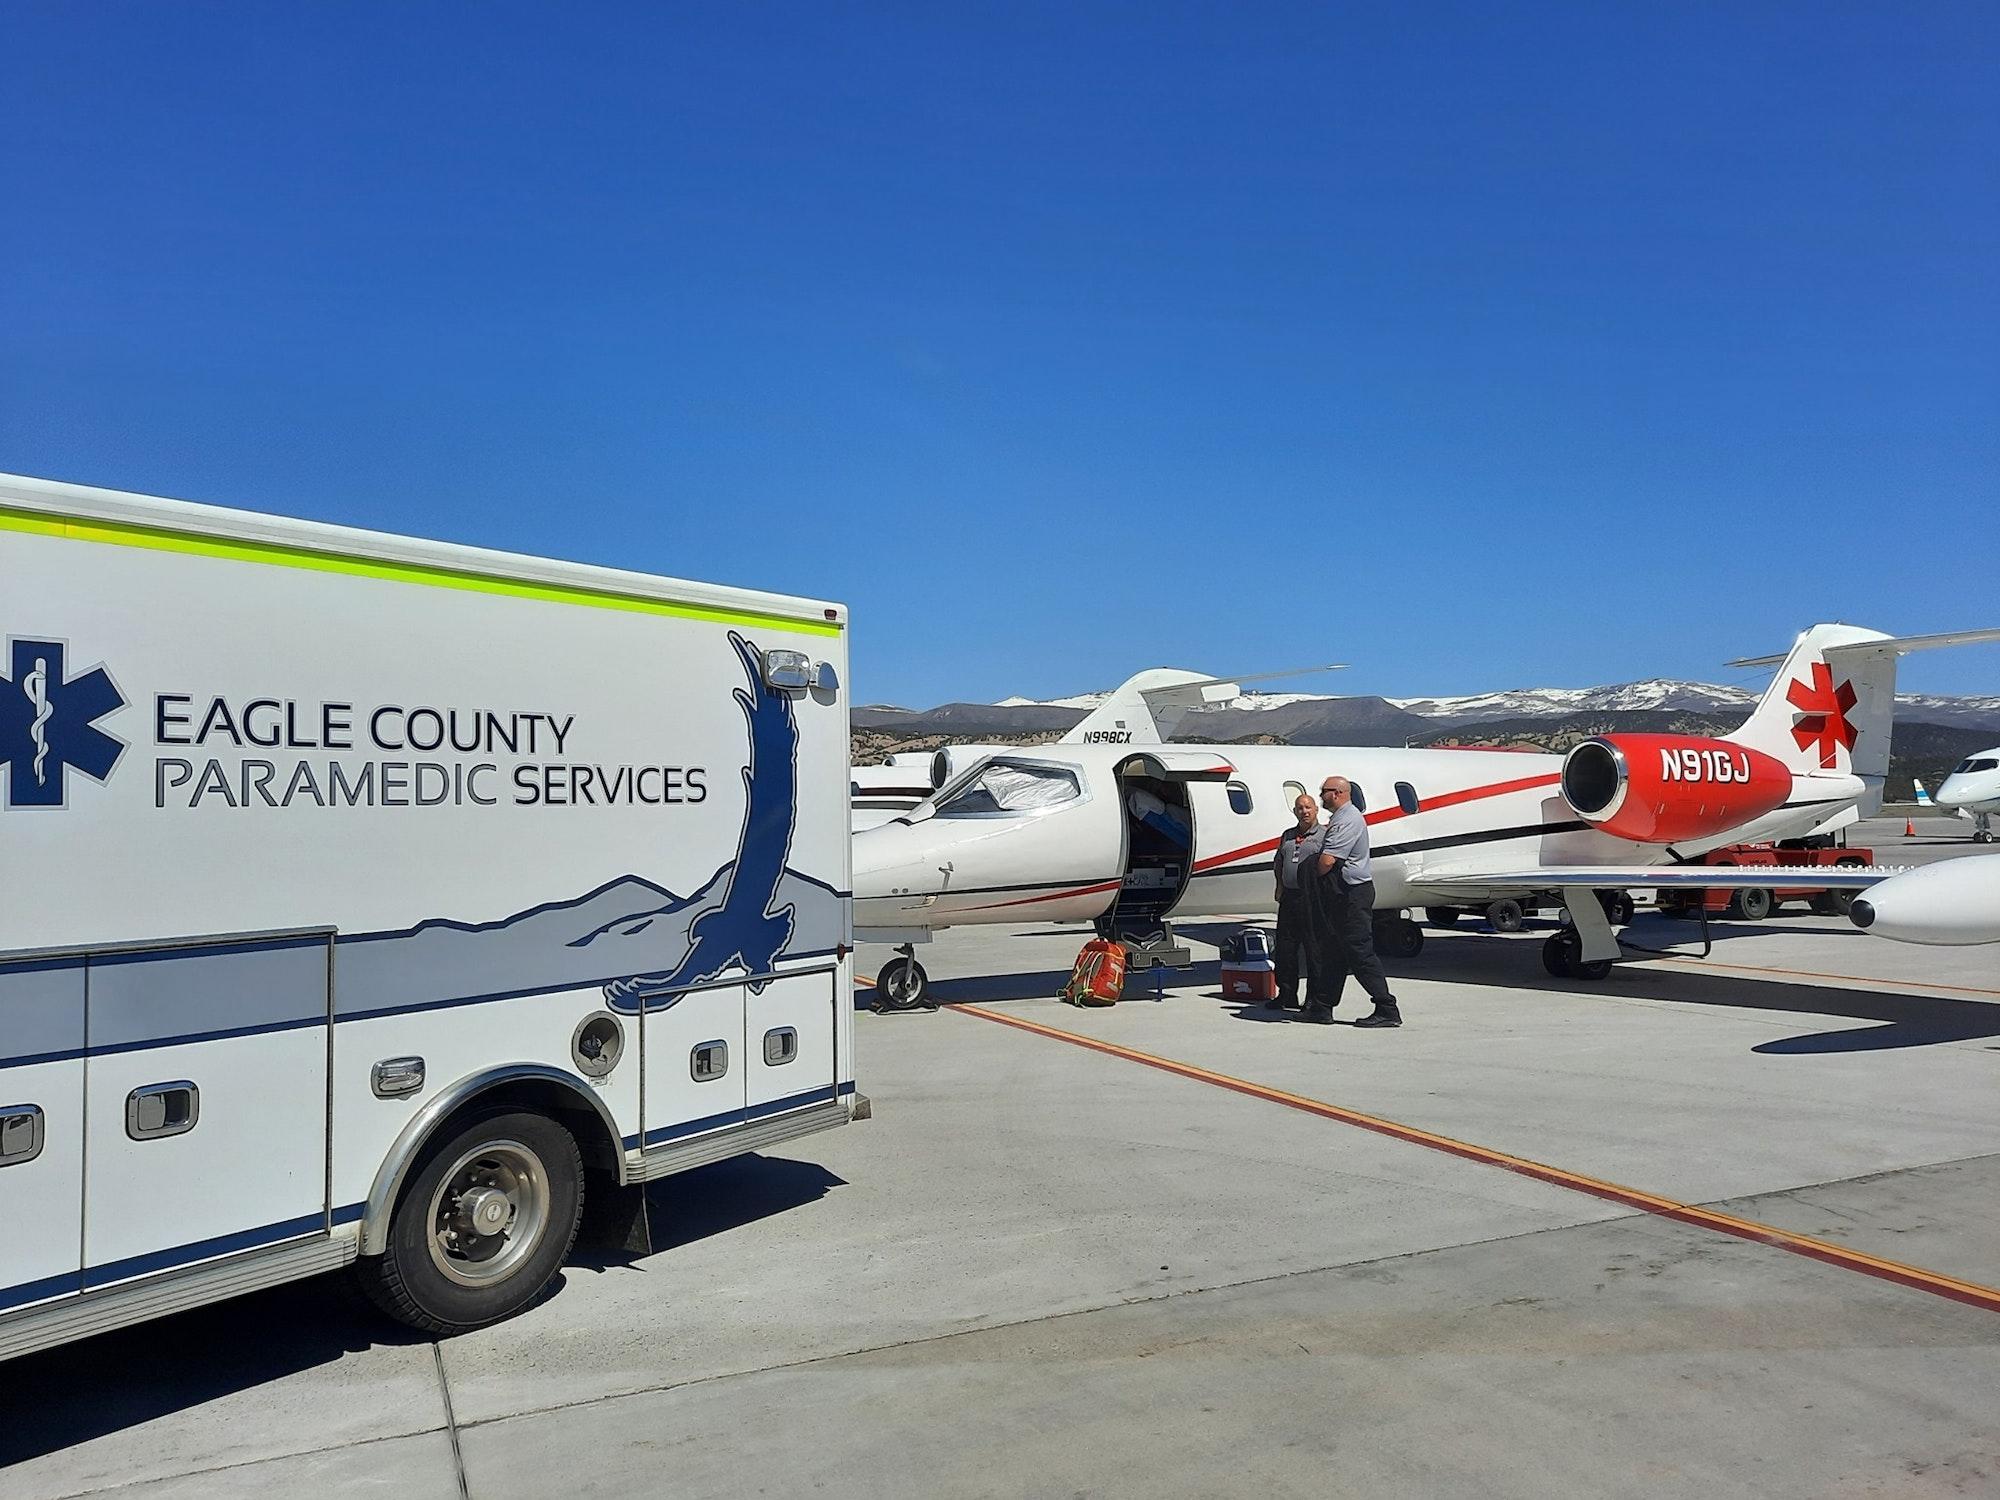 May contain: person, human, airplane, transportation, vehicle, and aircraft